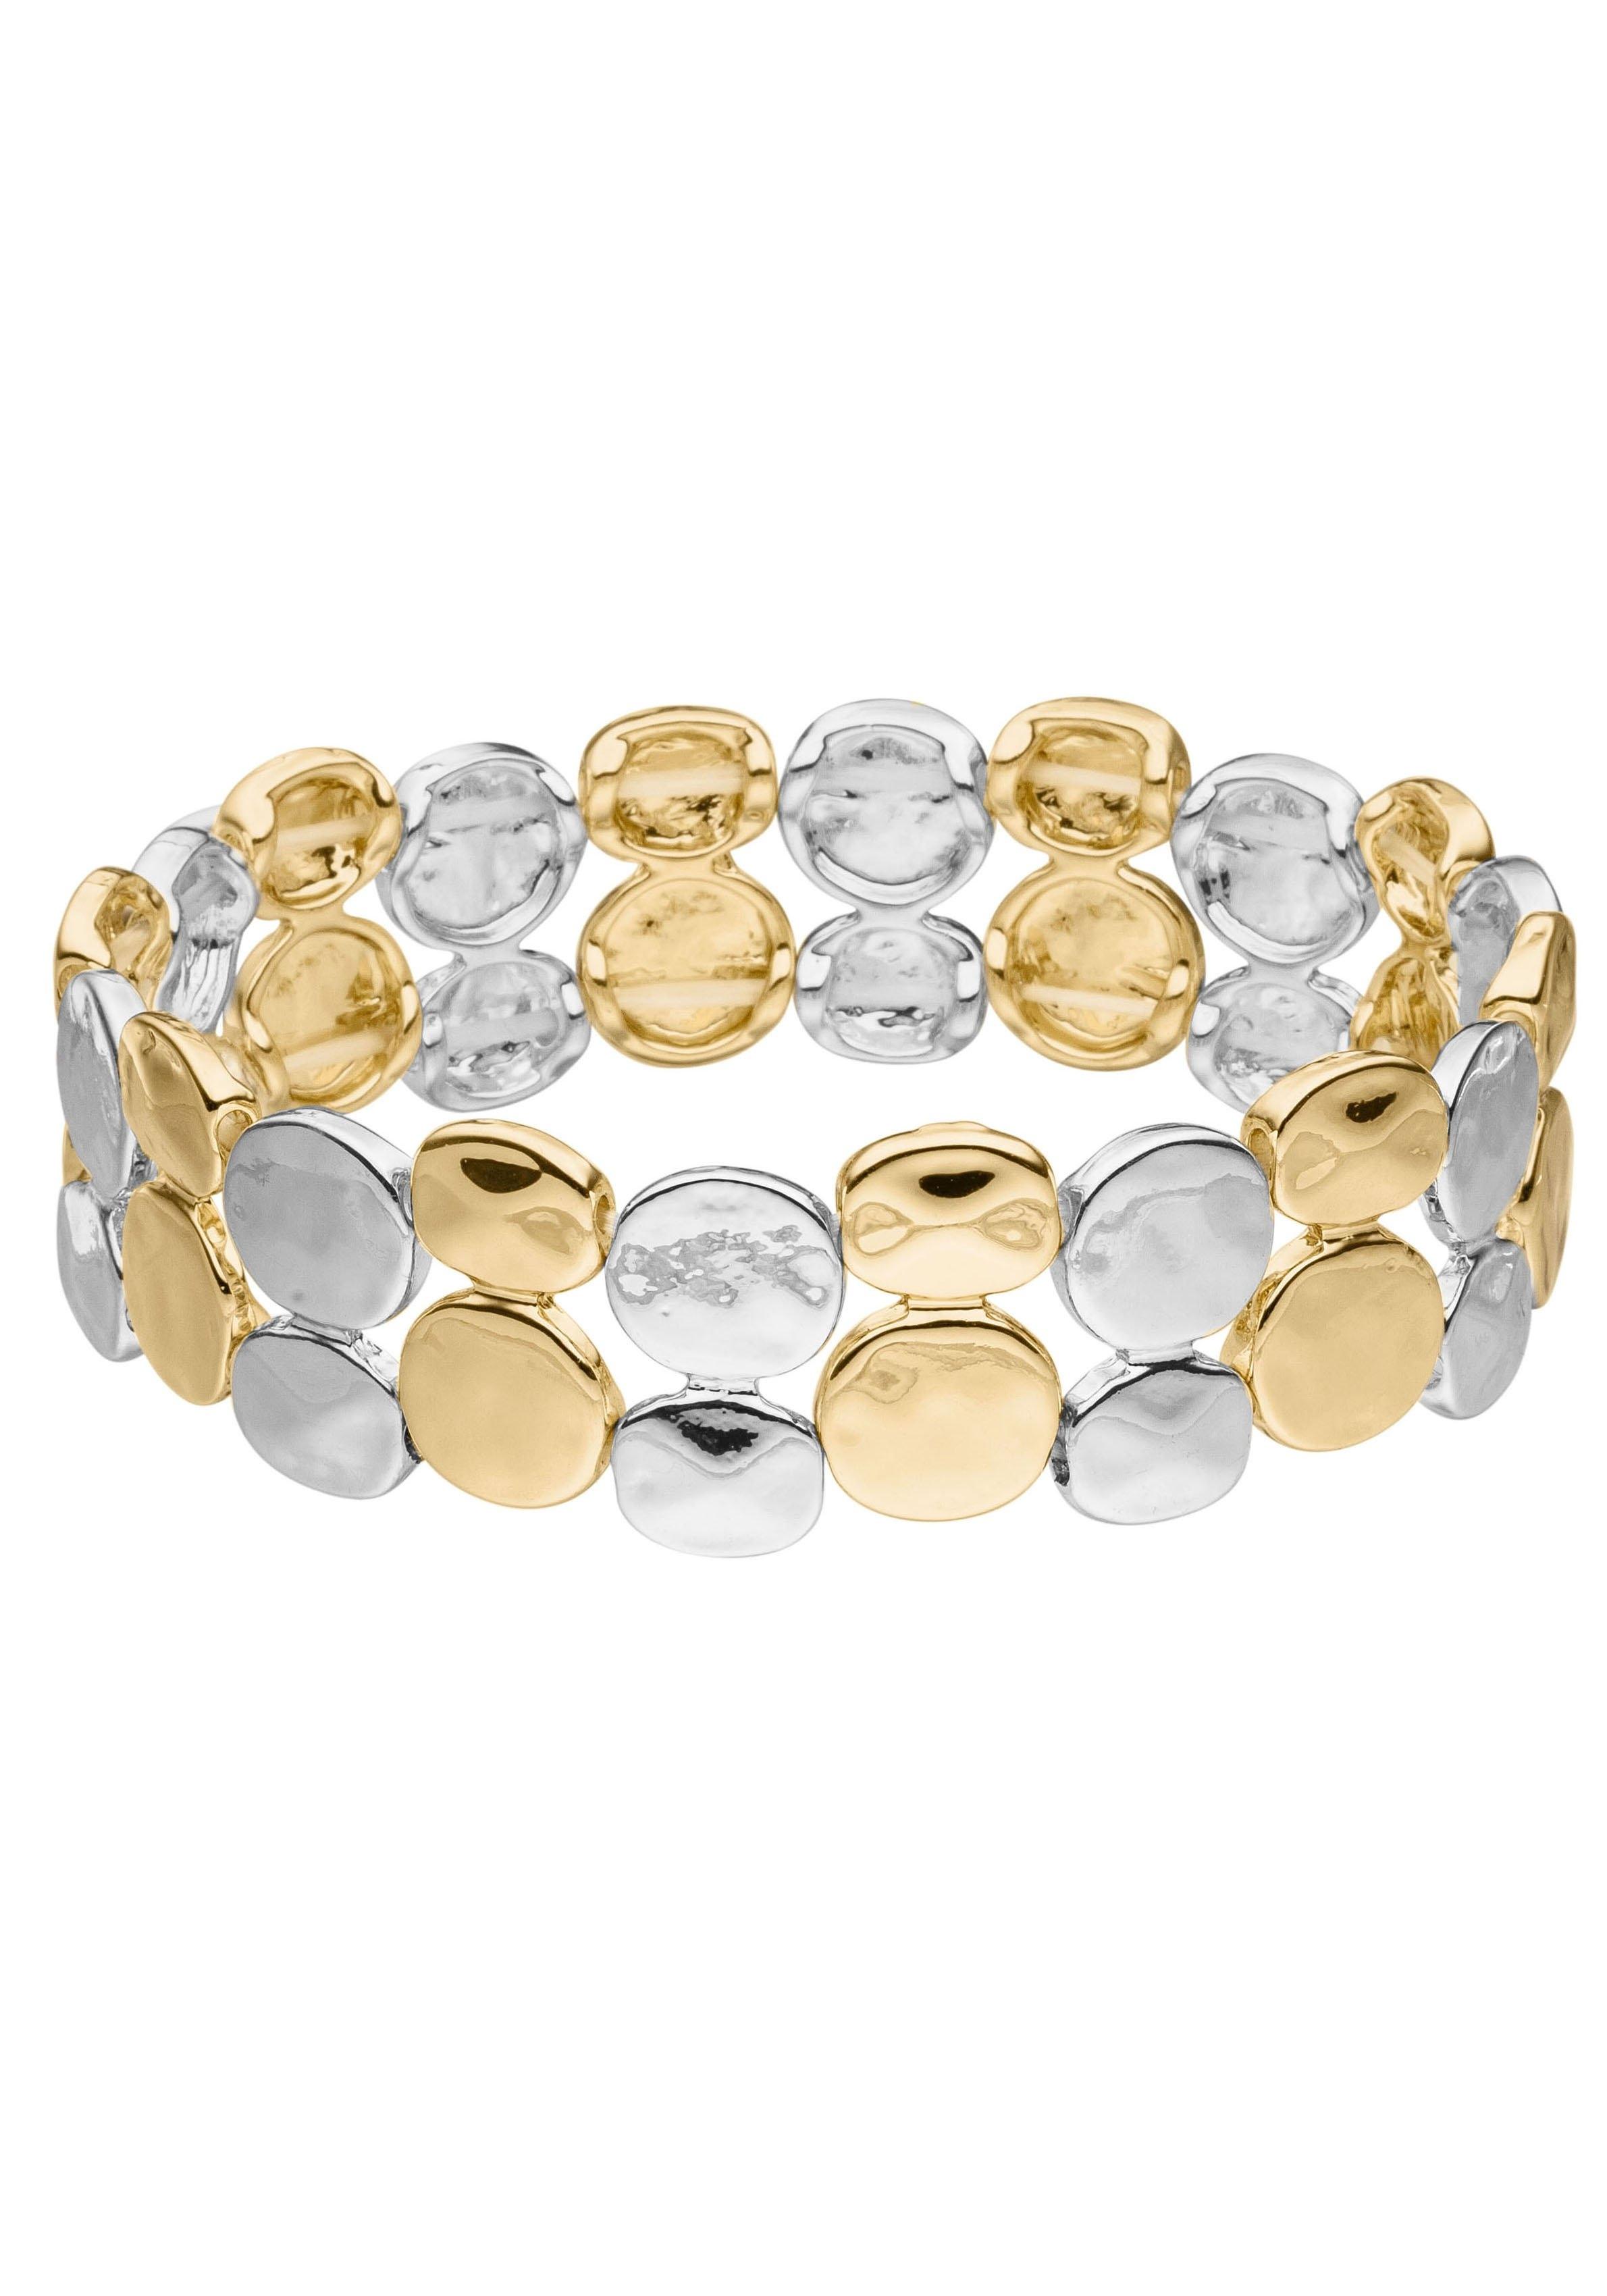 Tamaris Armband Jenny, TF073 nu online kopen bij OTTO